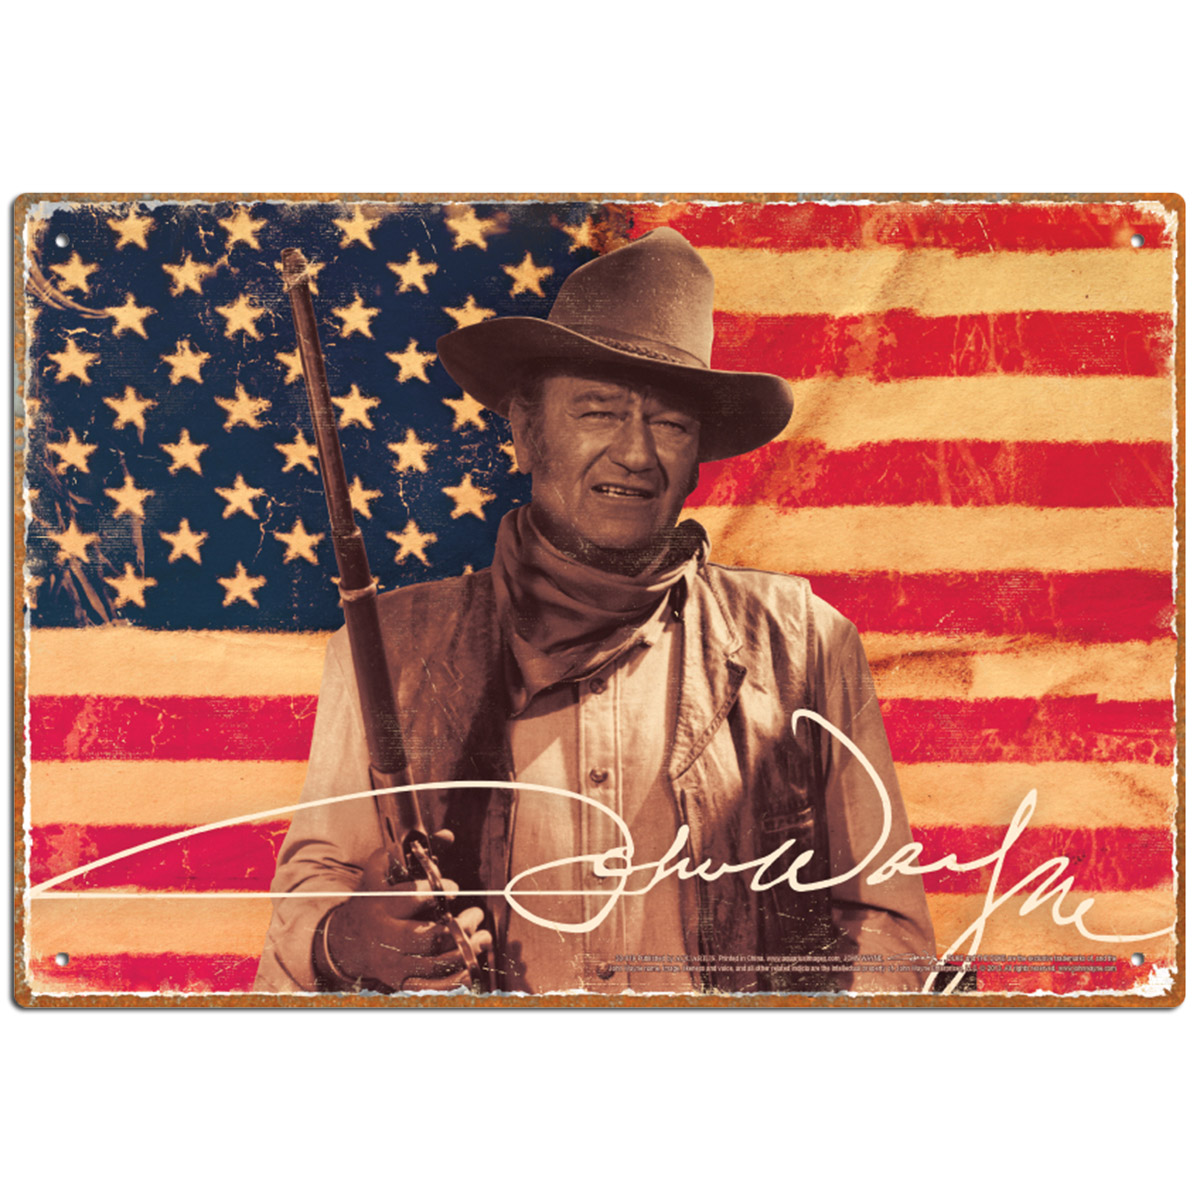 John Wayne American Flag Metal Sign Western Cowboy Movie Star Decor ...